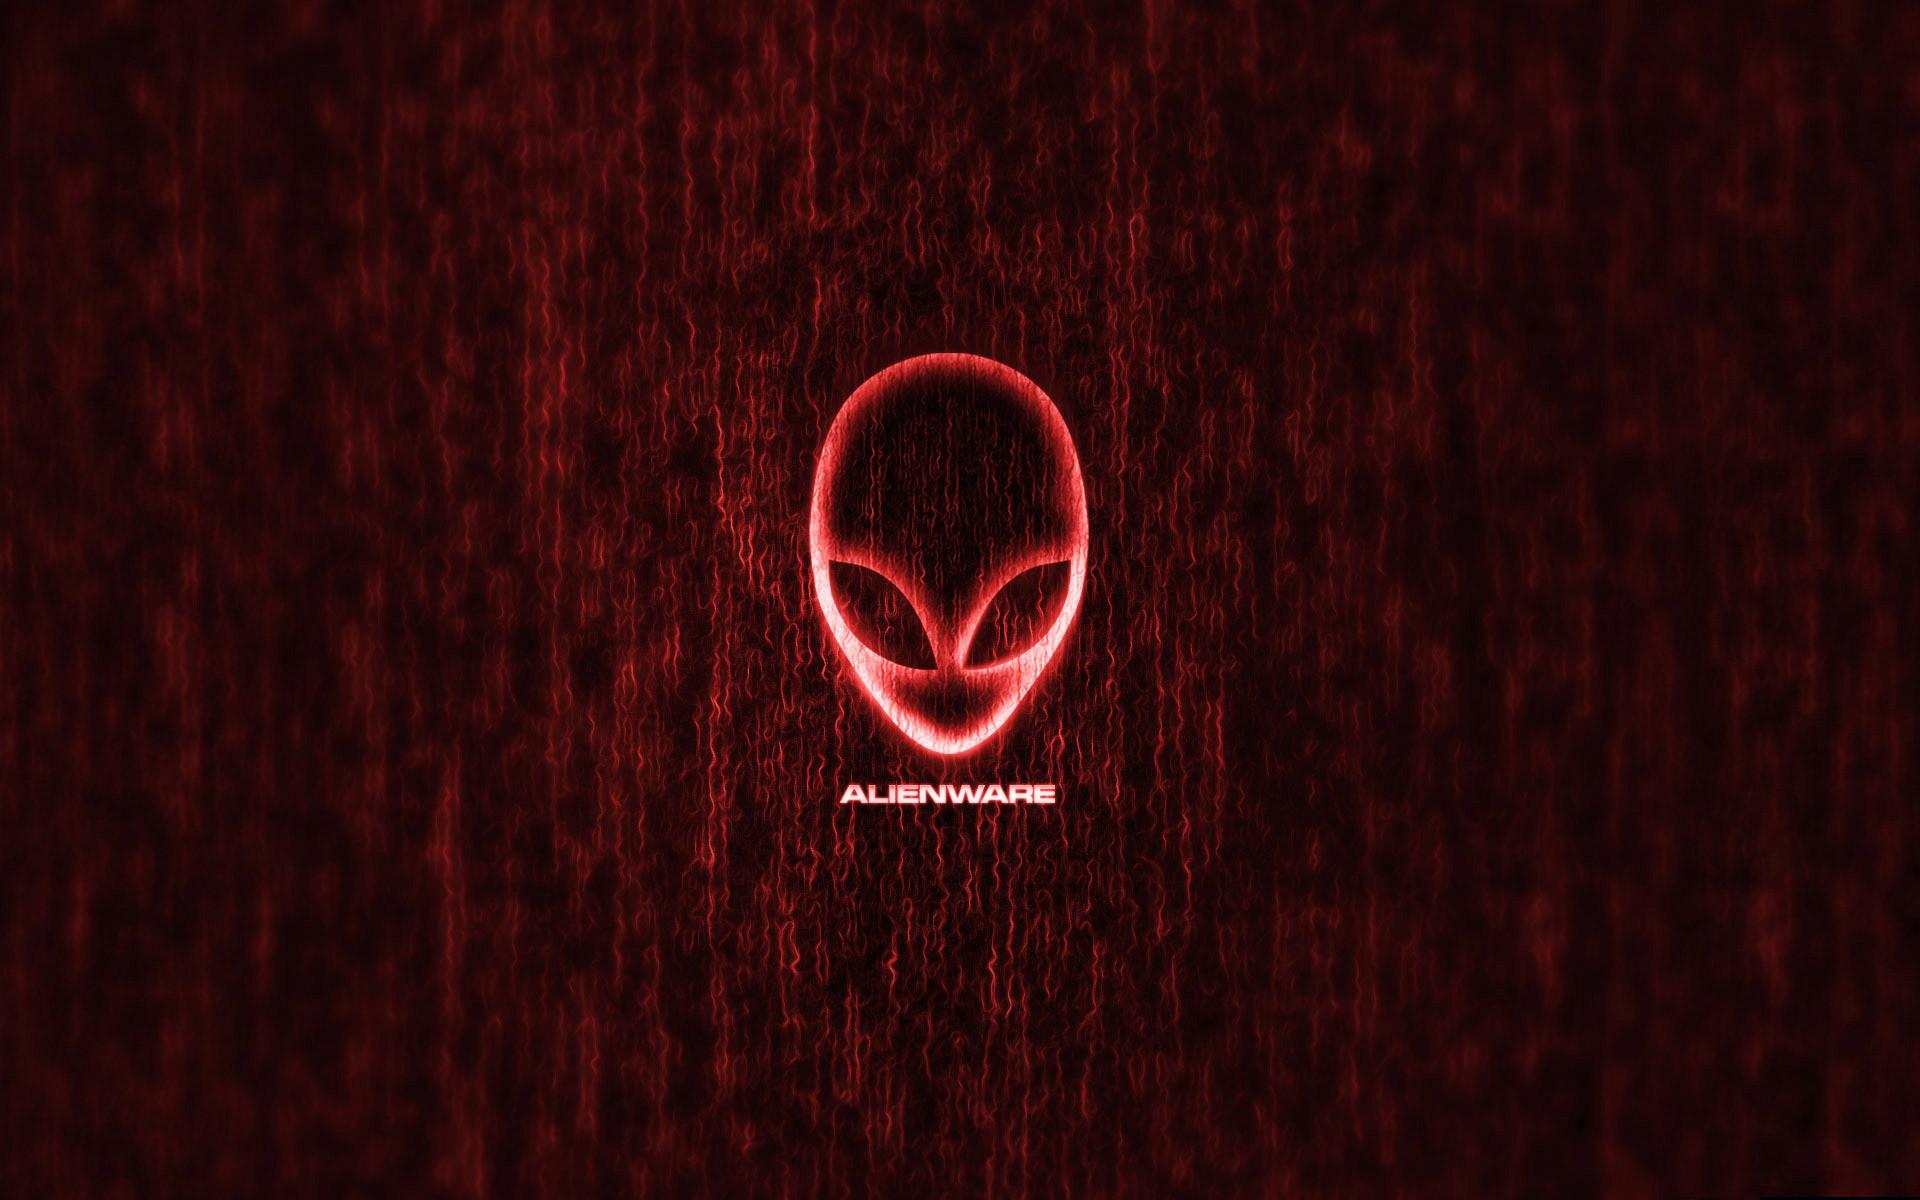 Red Alienware Matrix Wallpaper HD